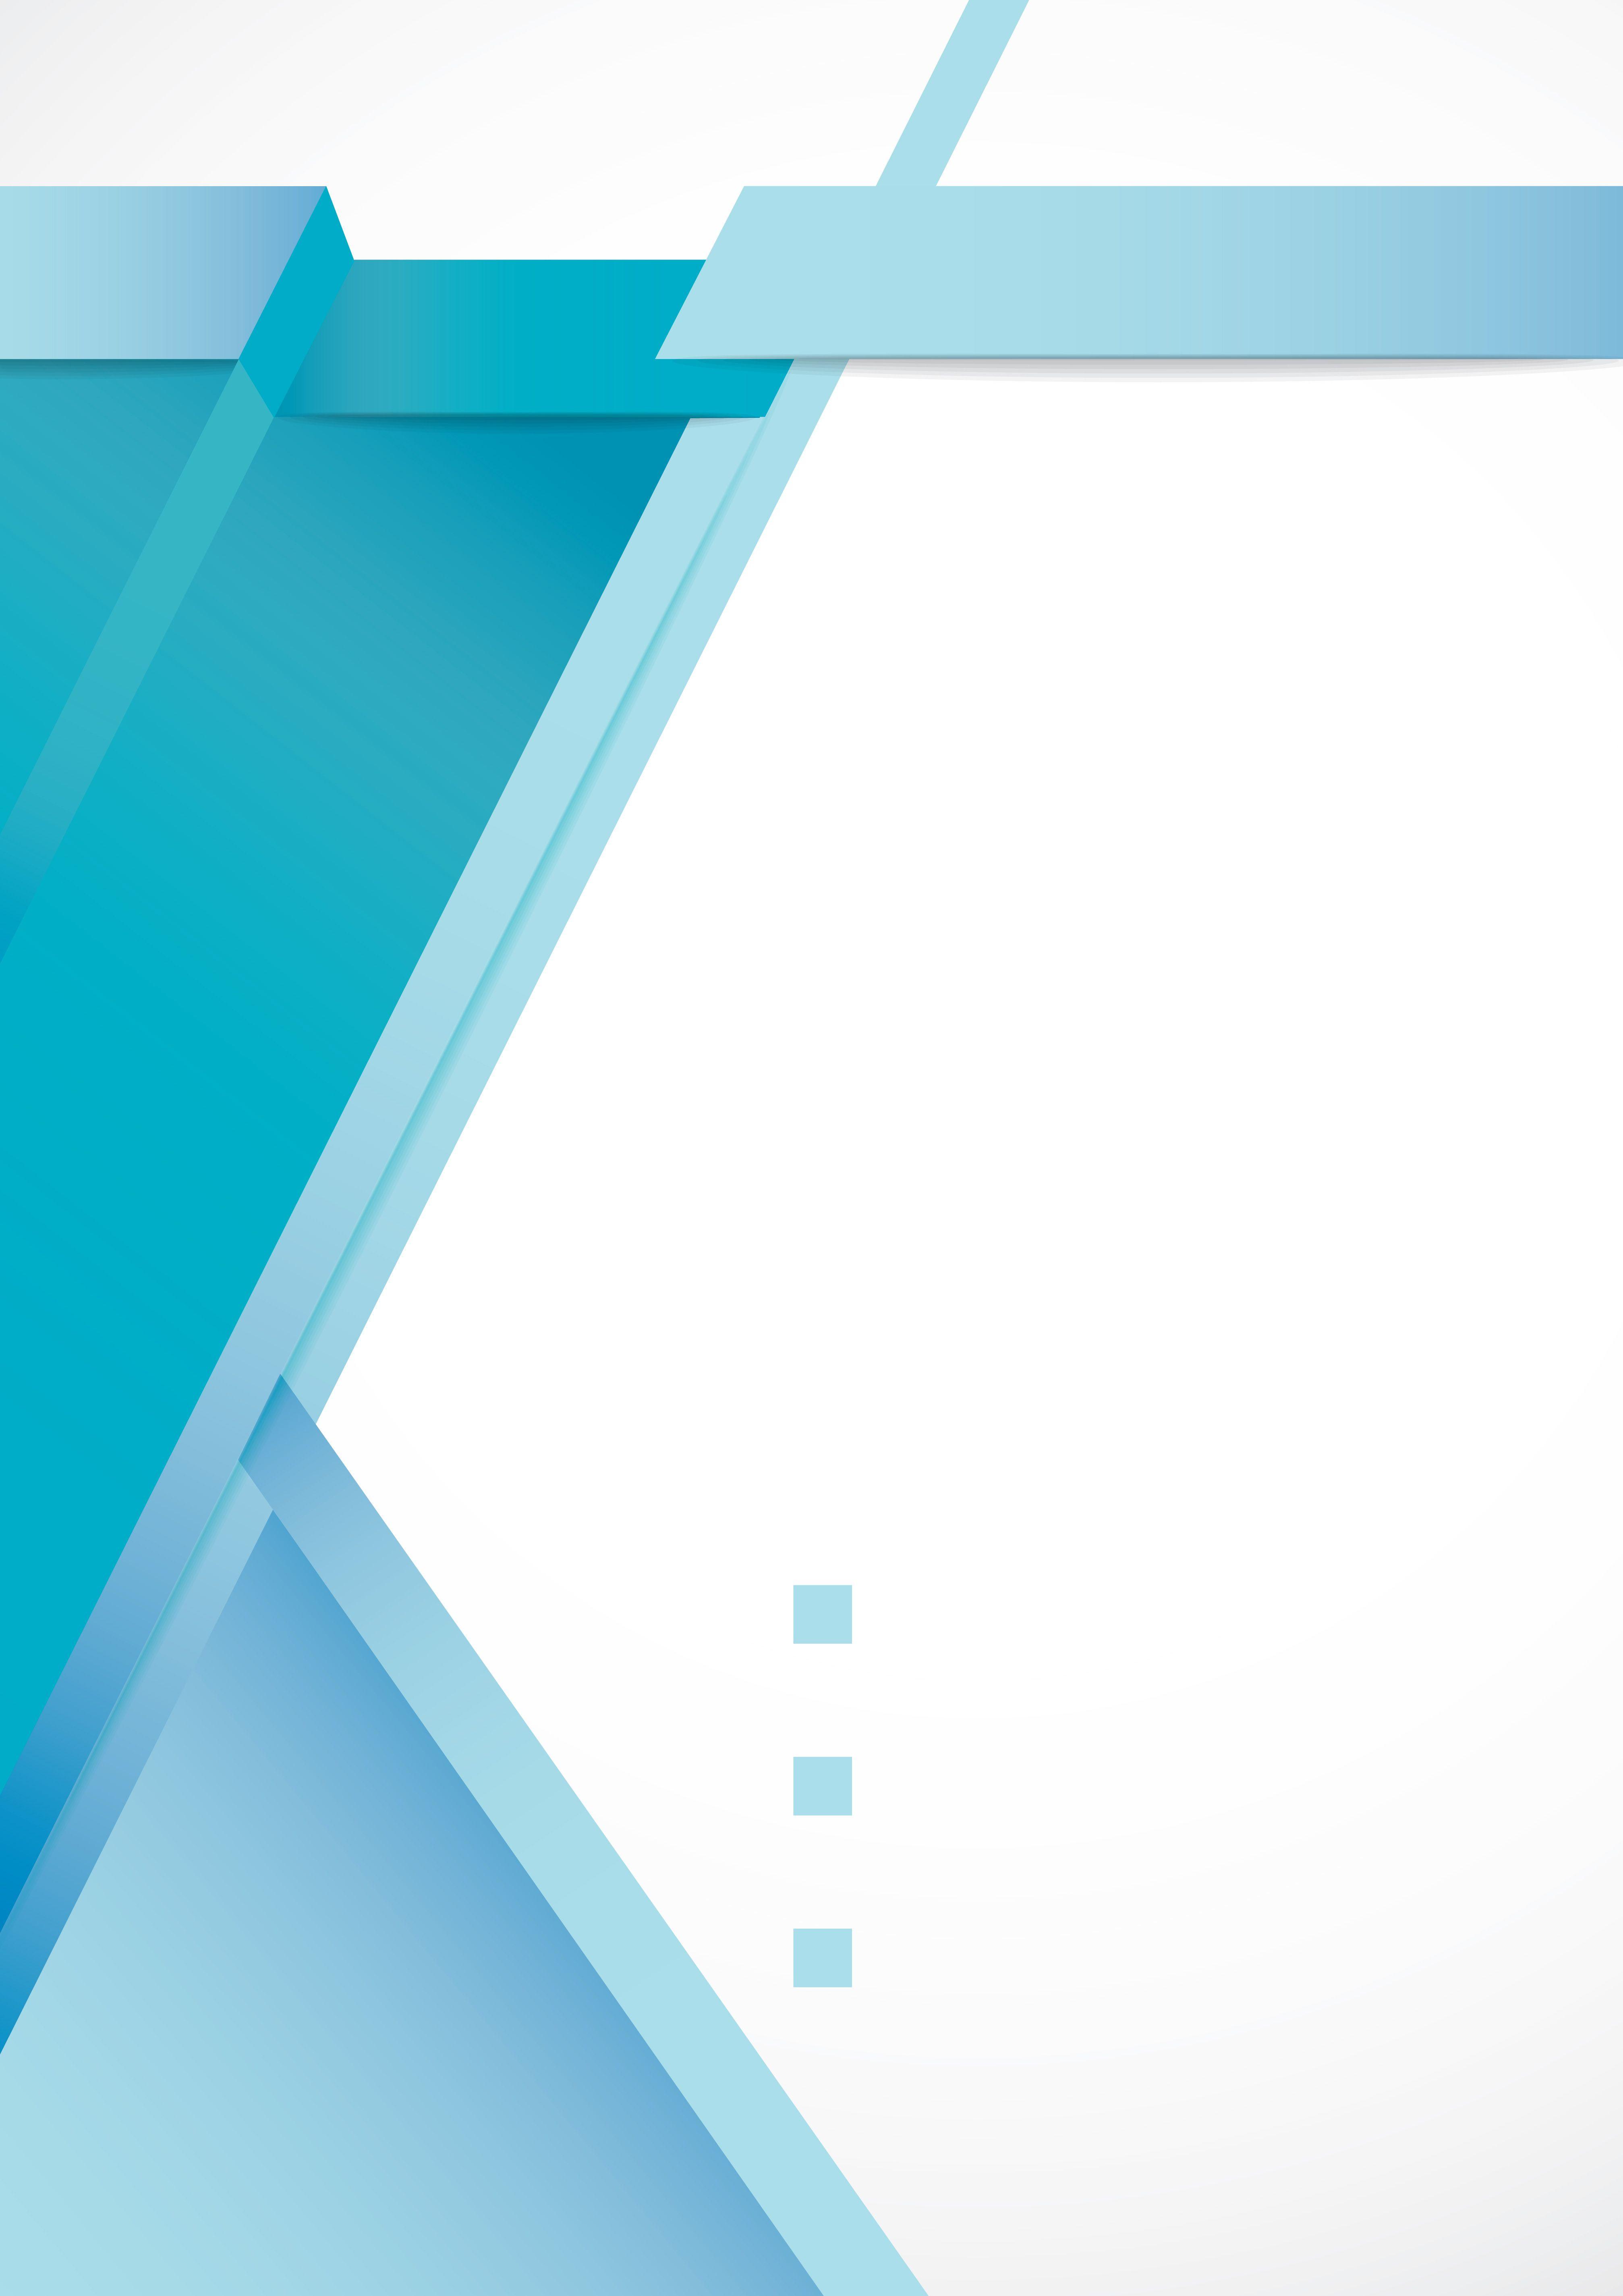 Carteles De Negocios Vector Azul Powerpoint Background Design Background Design Business Poster